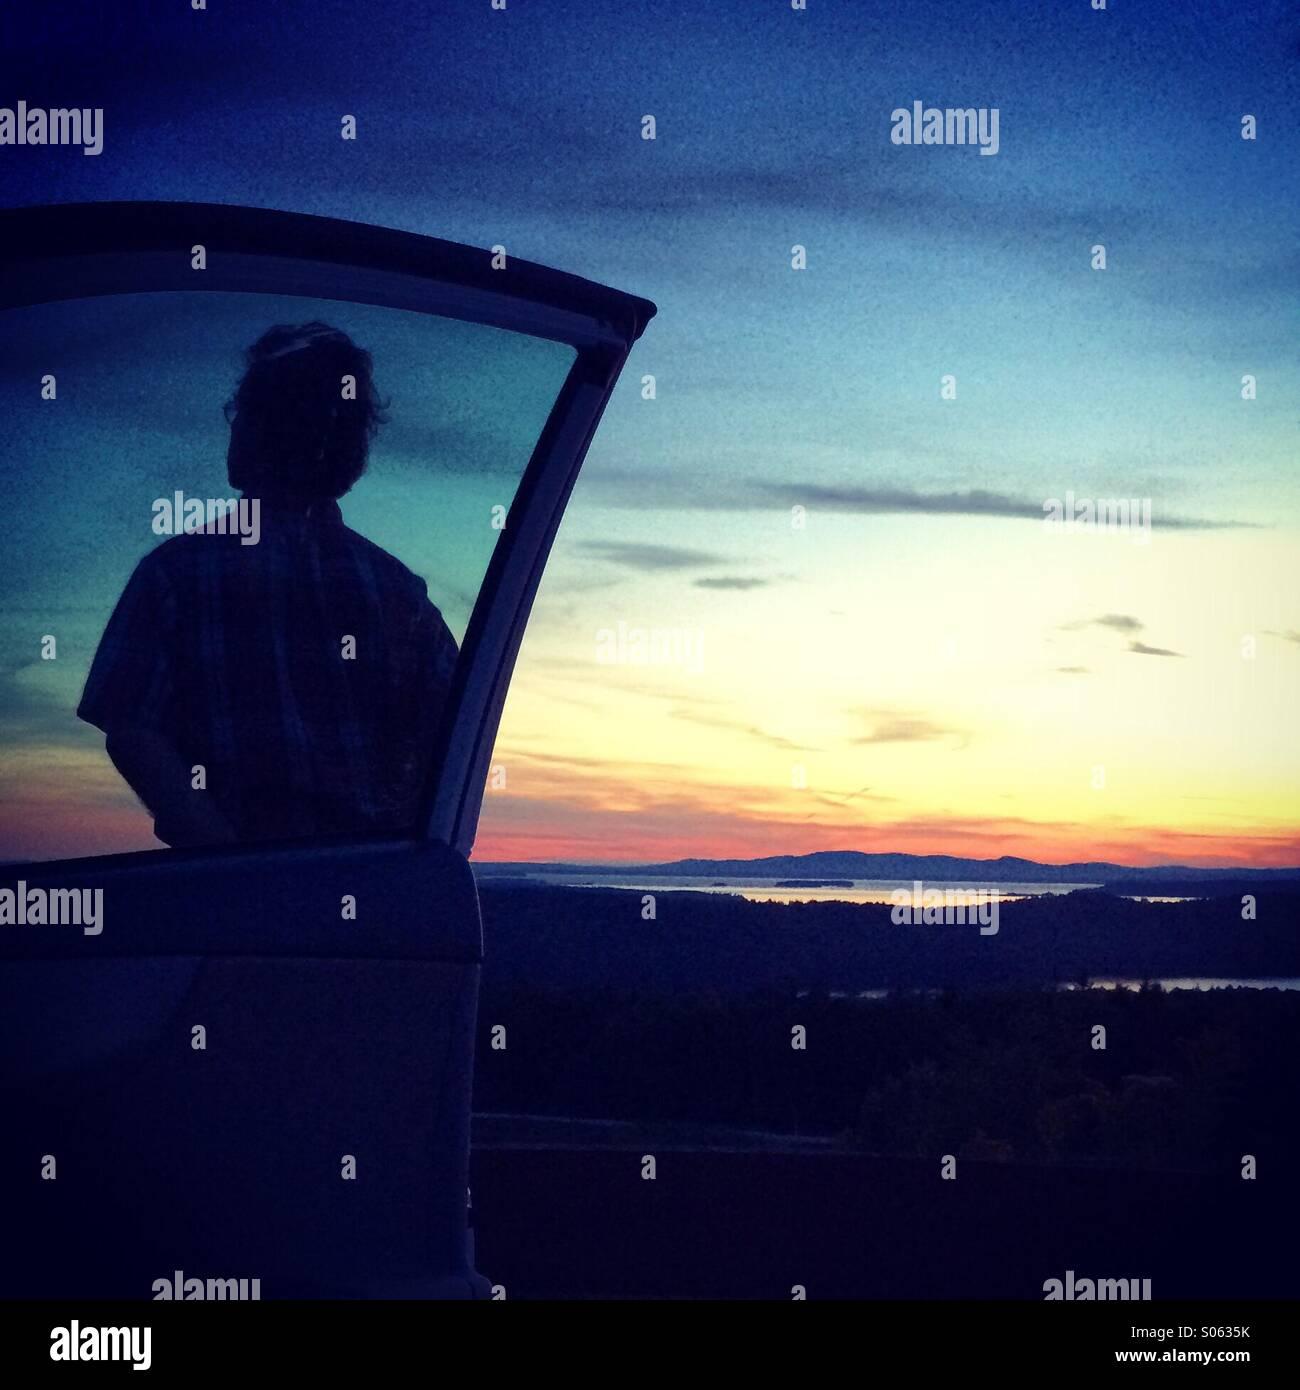 Sunset silhouette - Stock Image